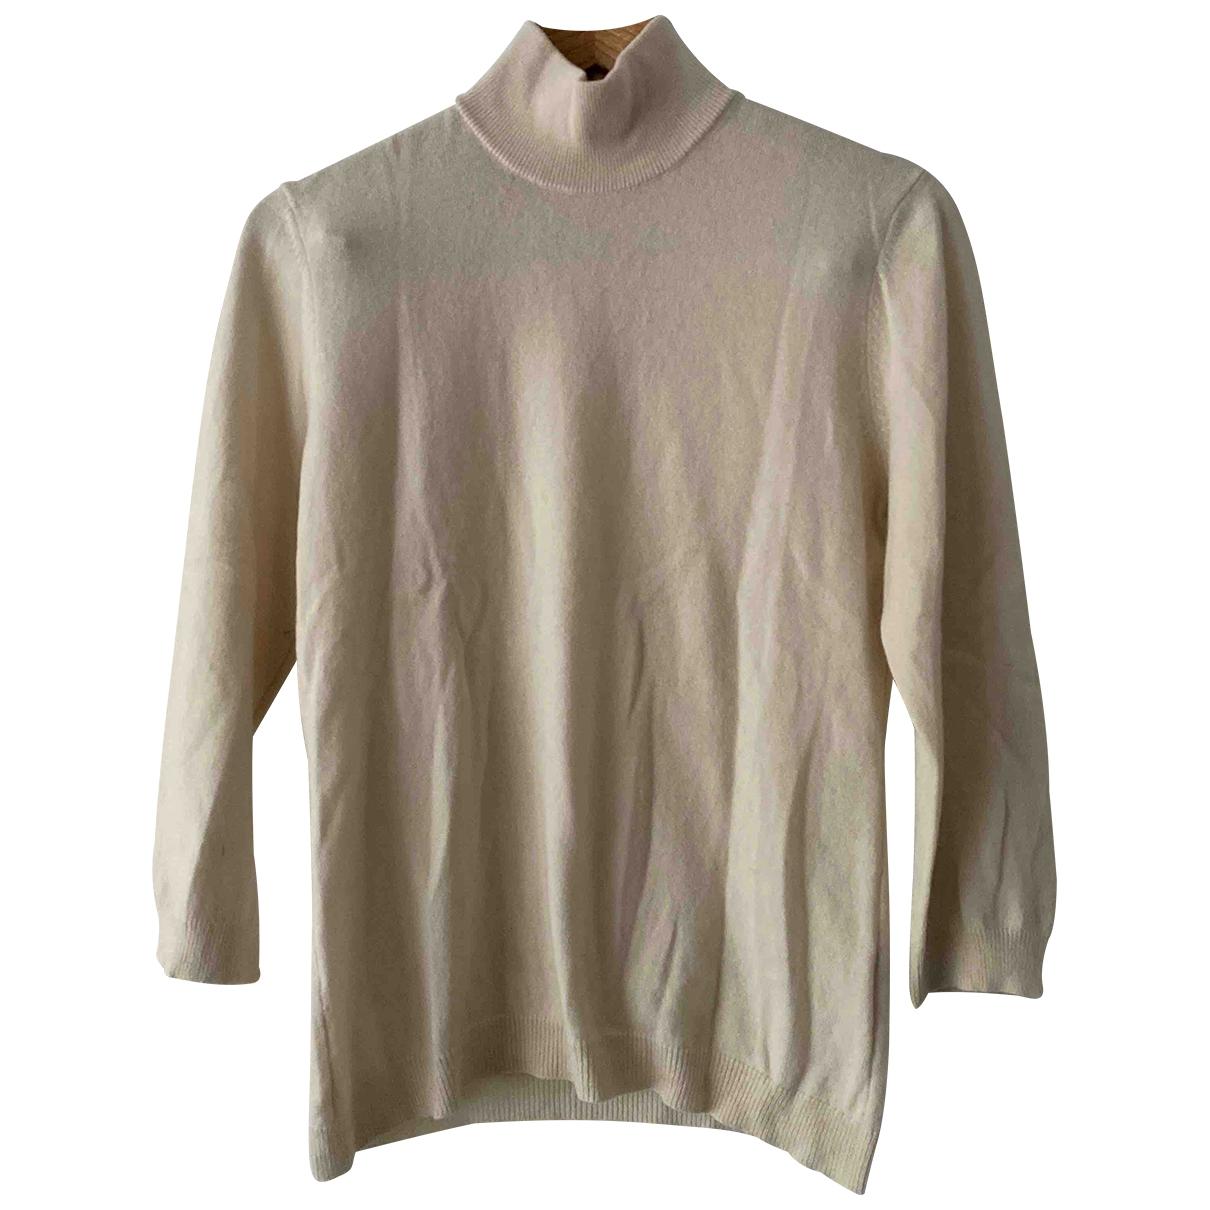 Tory Burch \N Ecru Cashmere Knitwear for Women L International